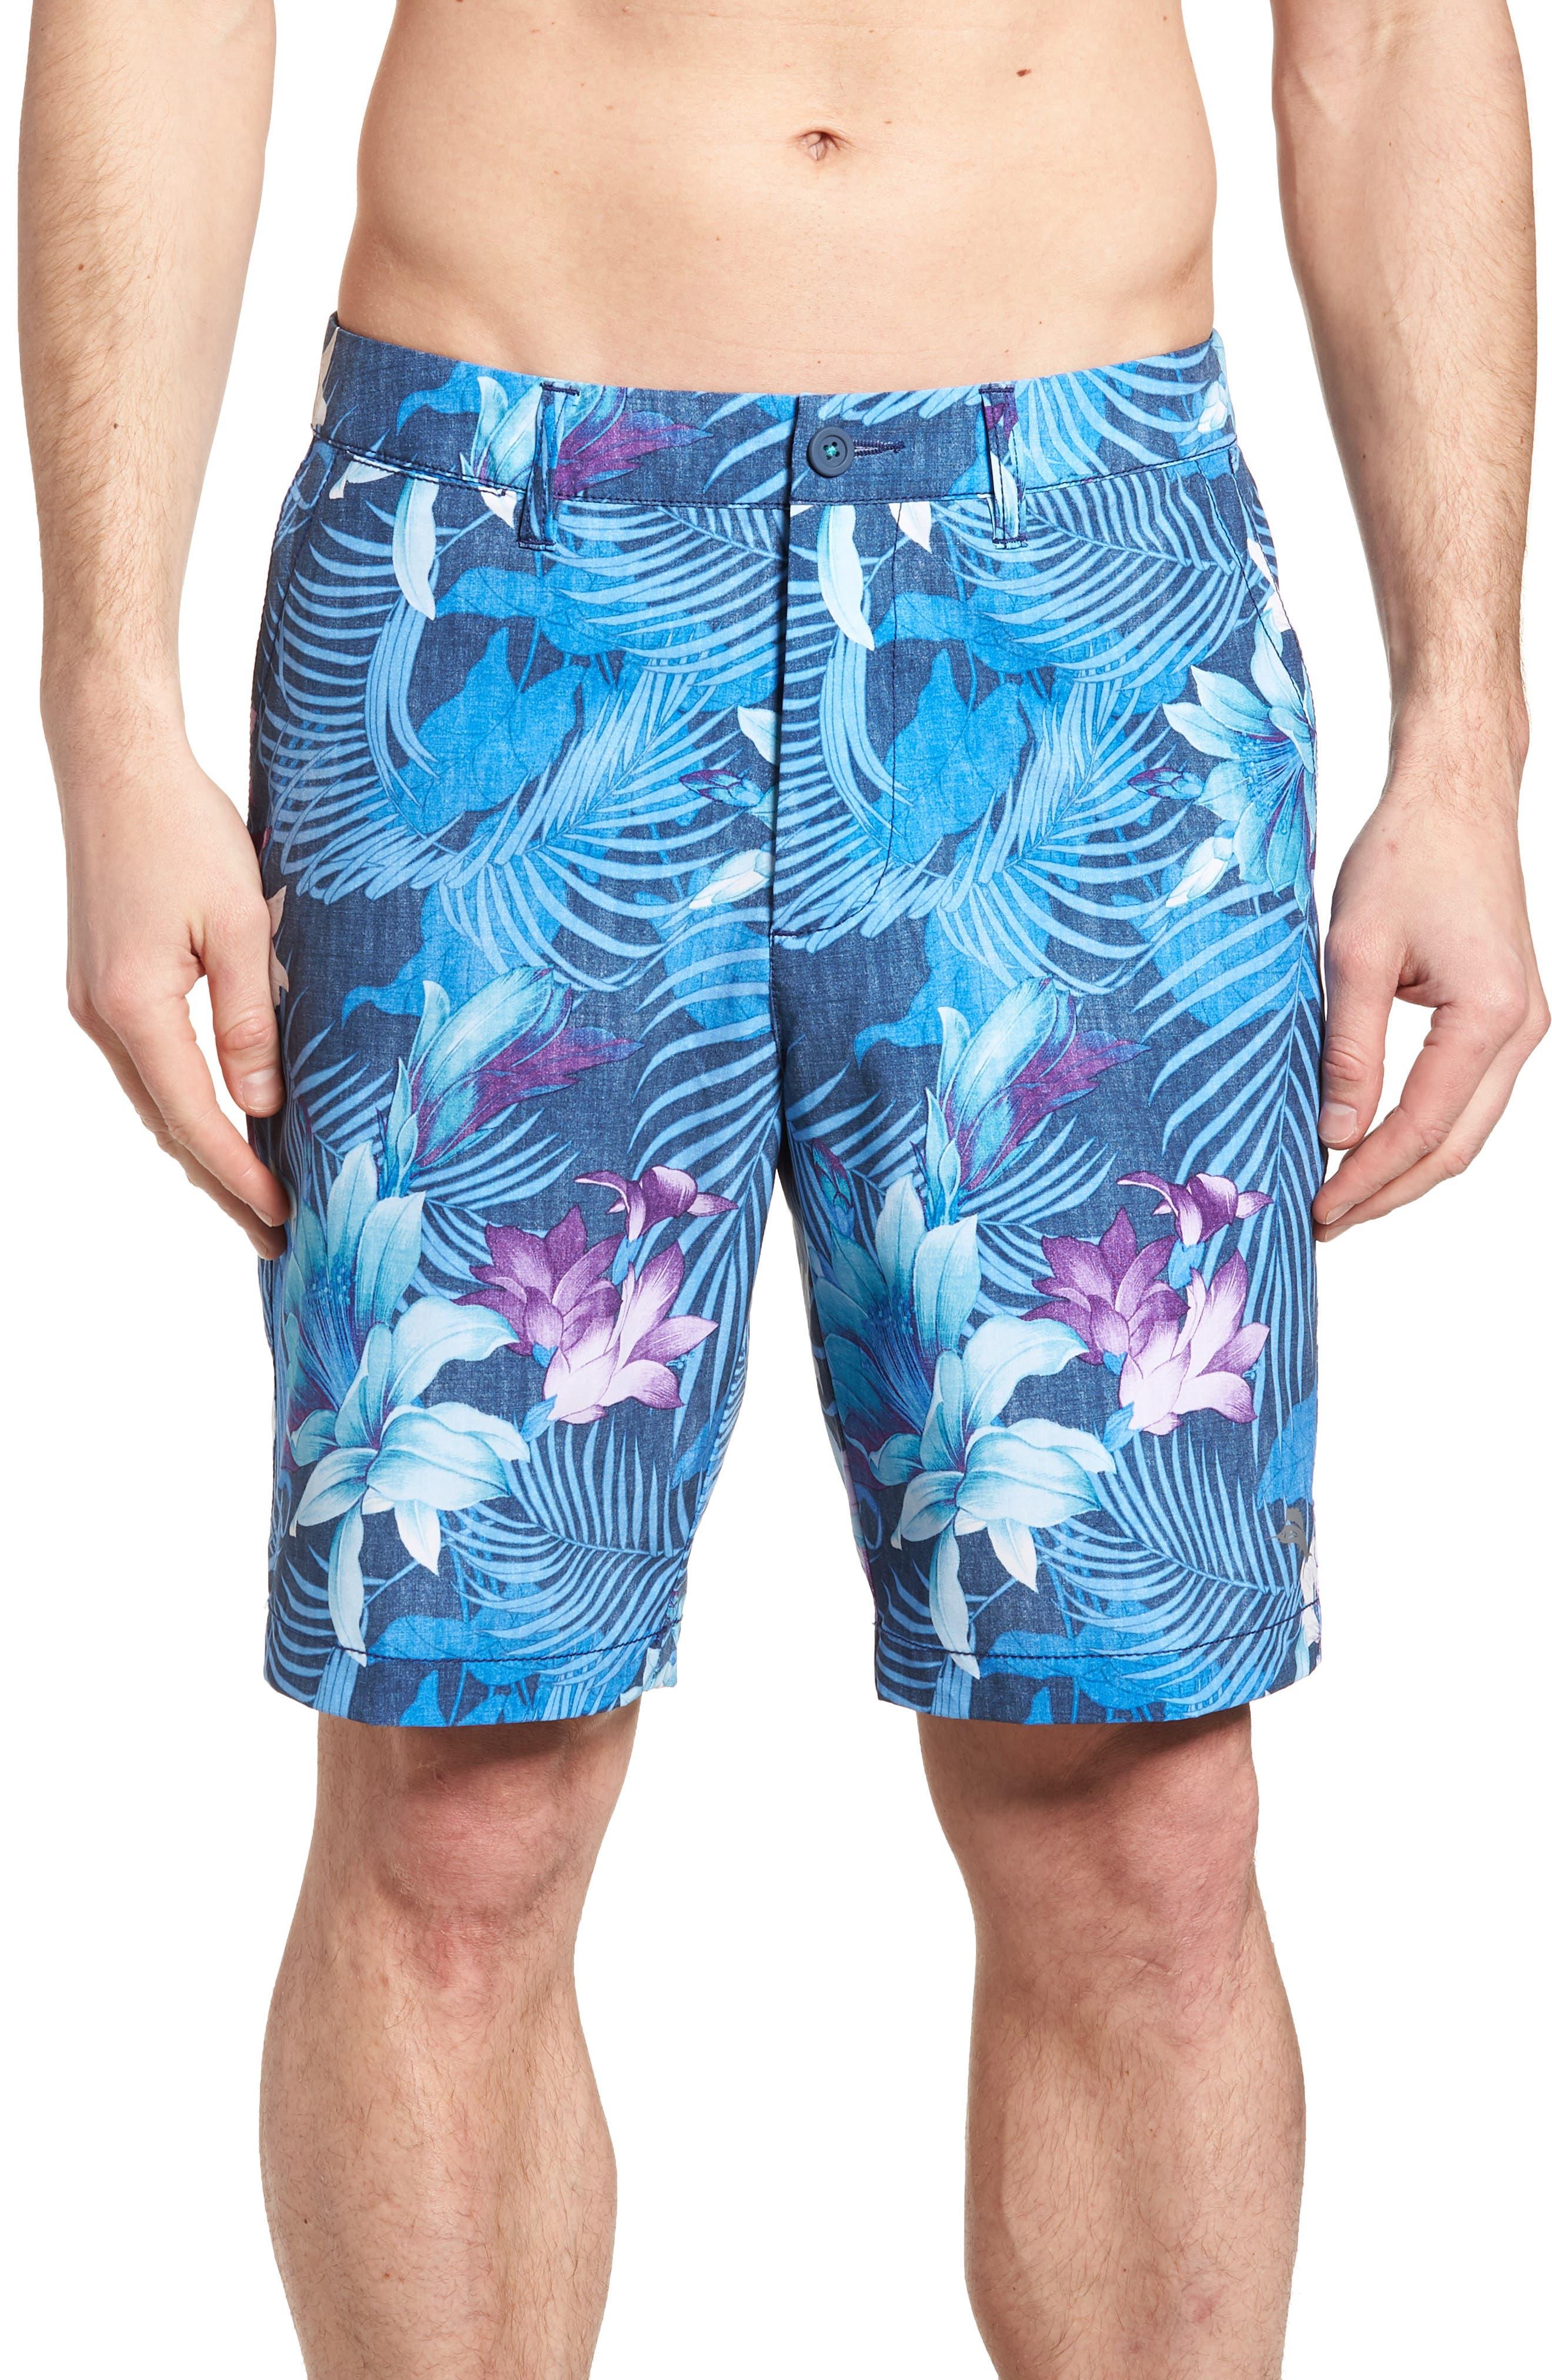 Cayman Laredo Blooms Board Shorts,                             Main thumbnail 1, color,                             Ocean Deep